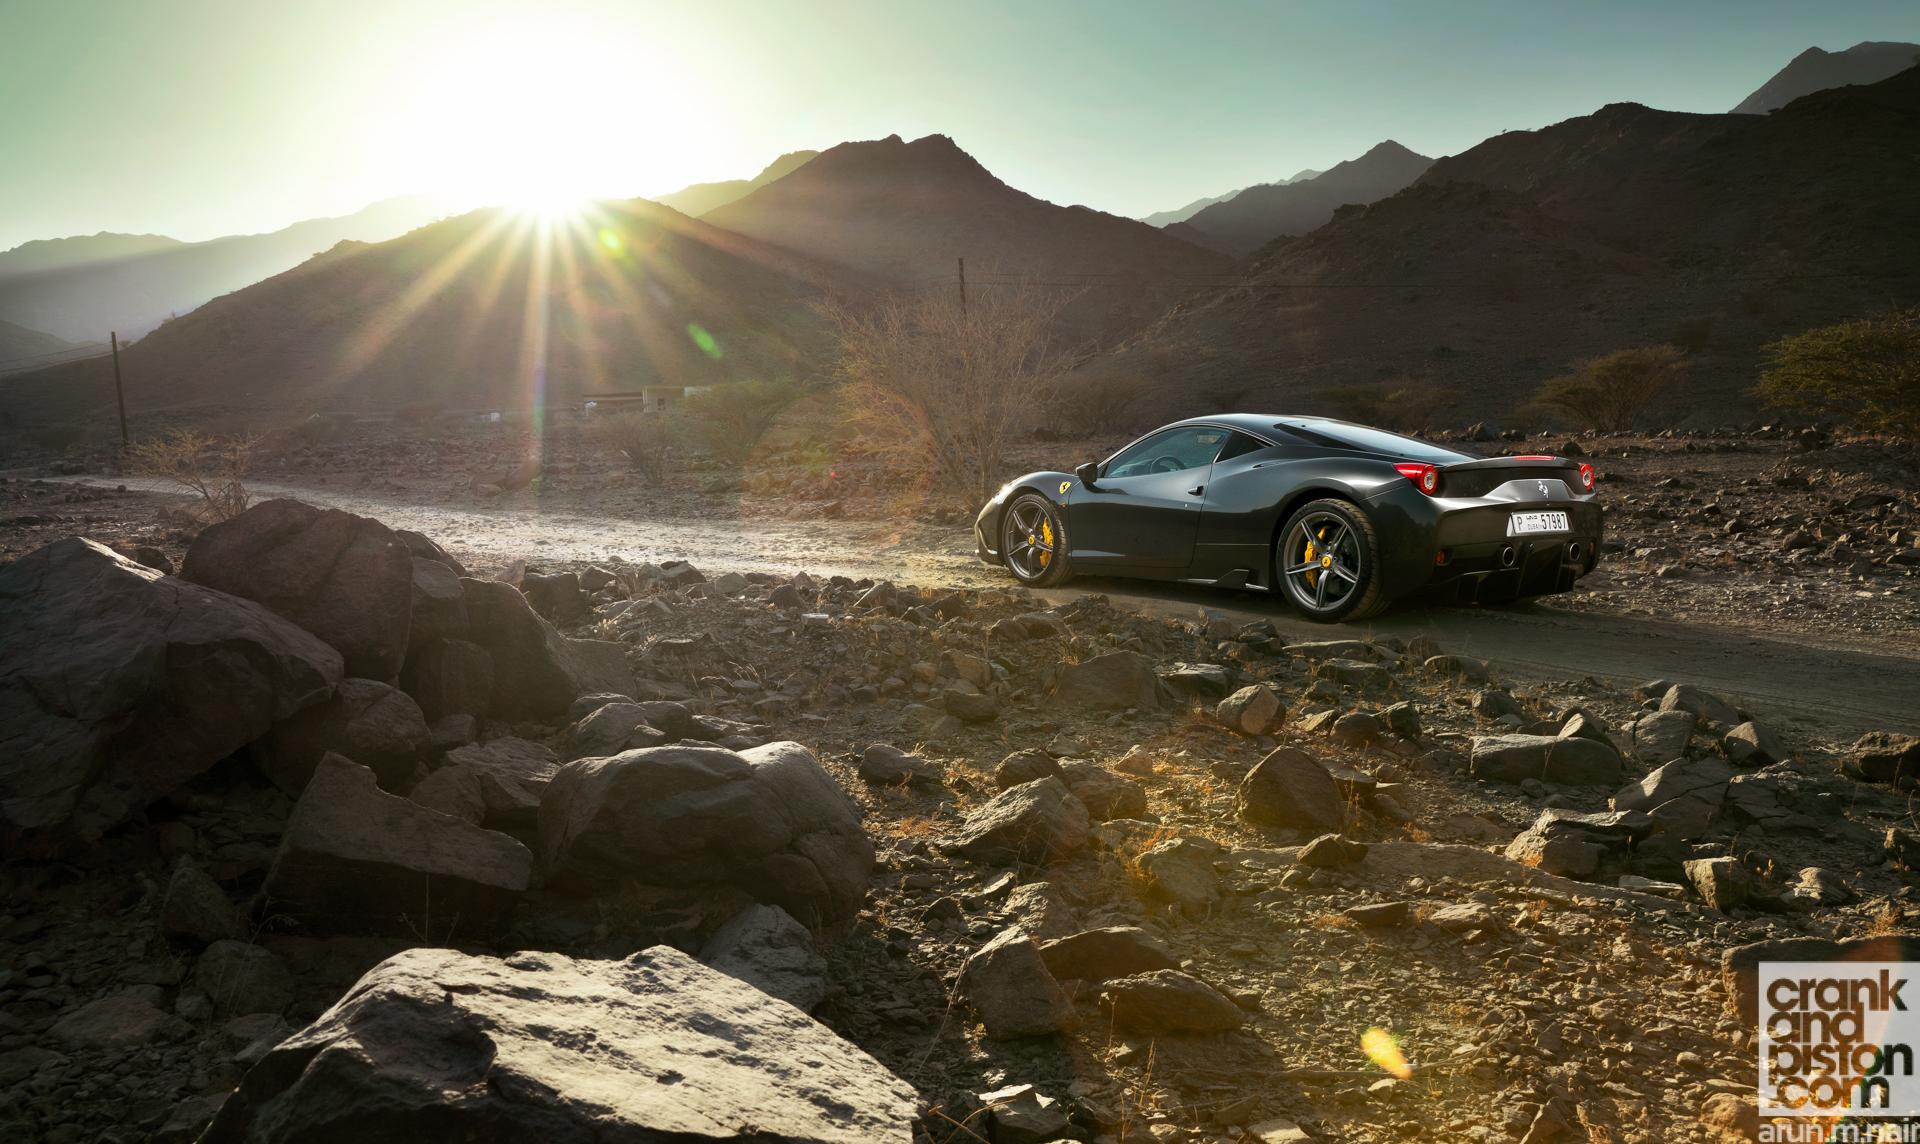 Ferrari 458 Speciale Wallpapers-05